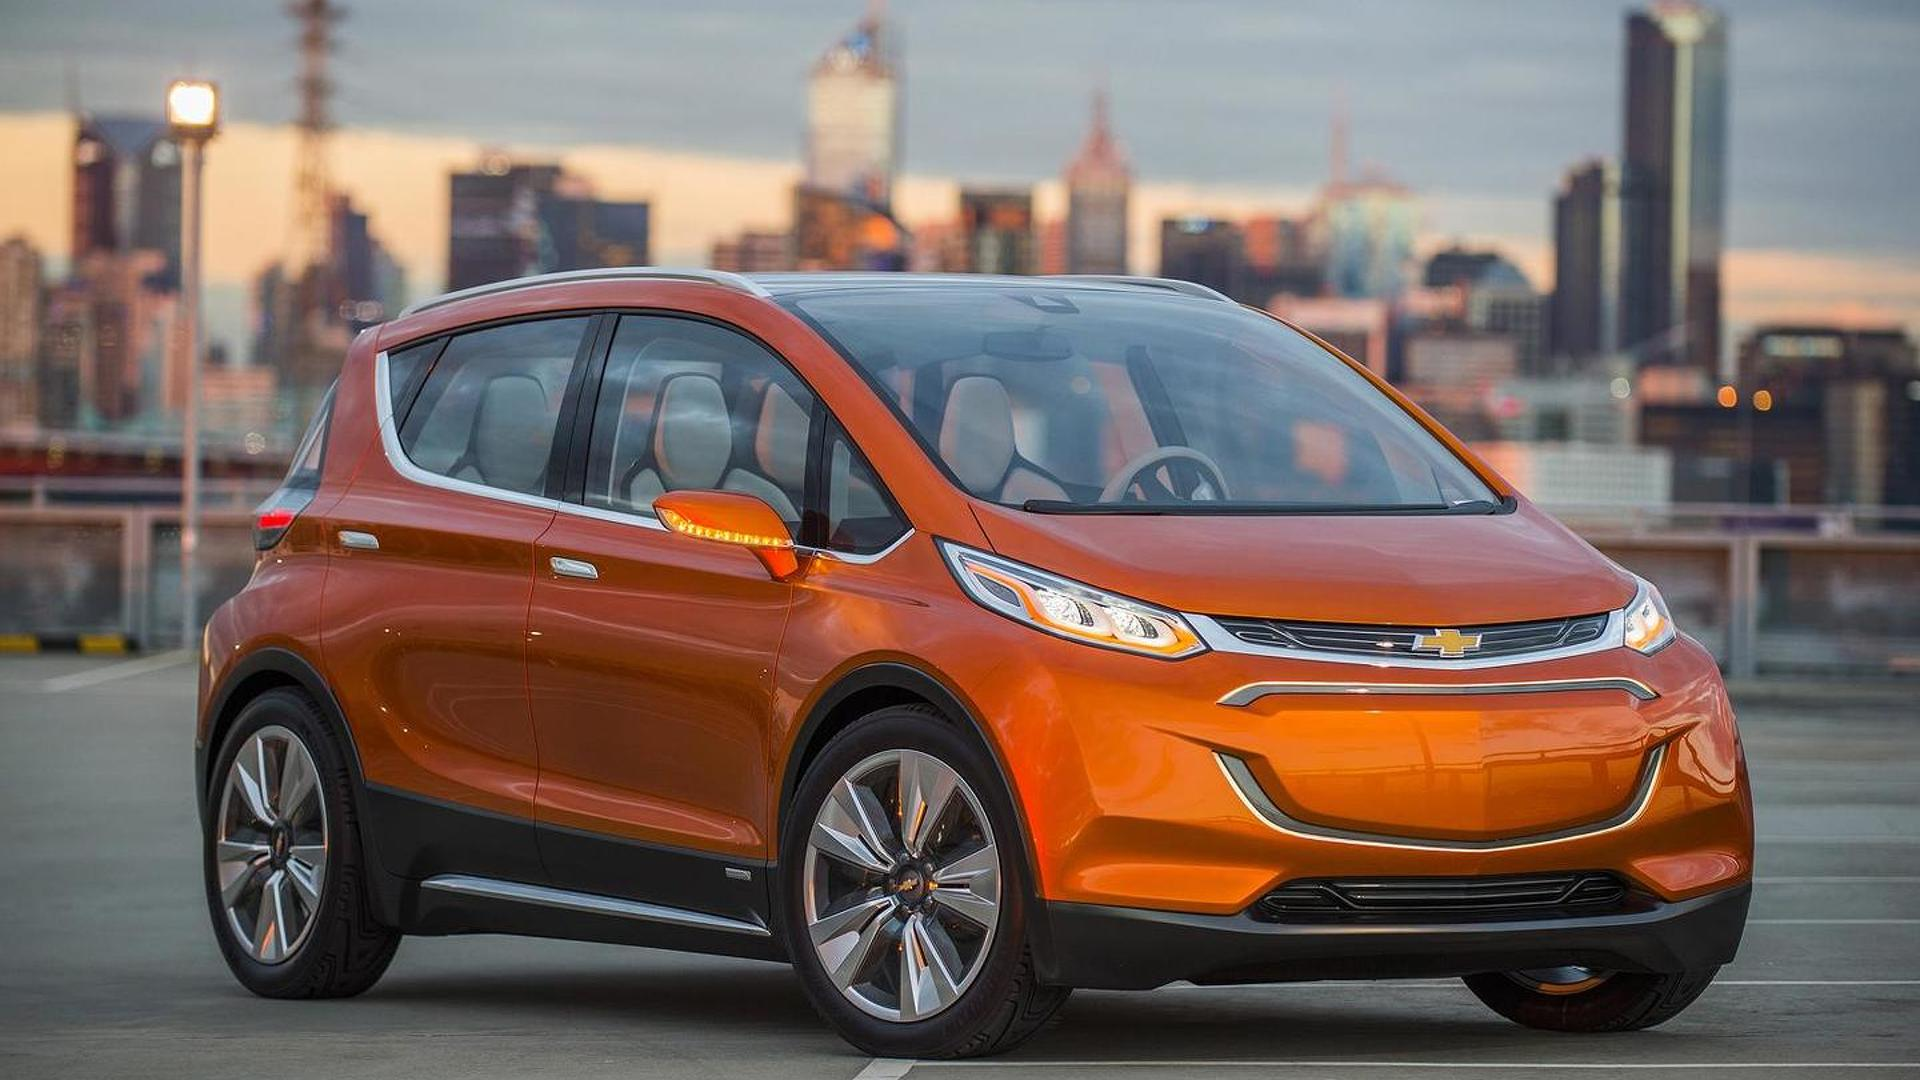 Chevrolet Bolt EV concept arrives at NAIAS with 200+ mile range [videos]